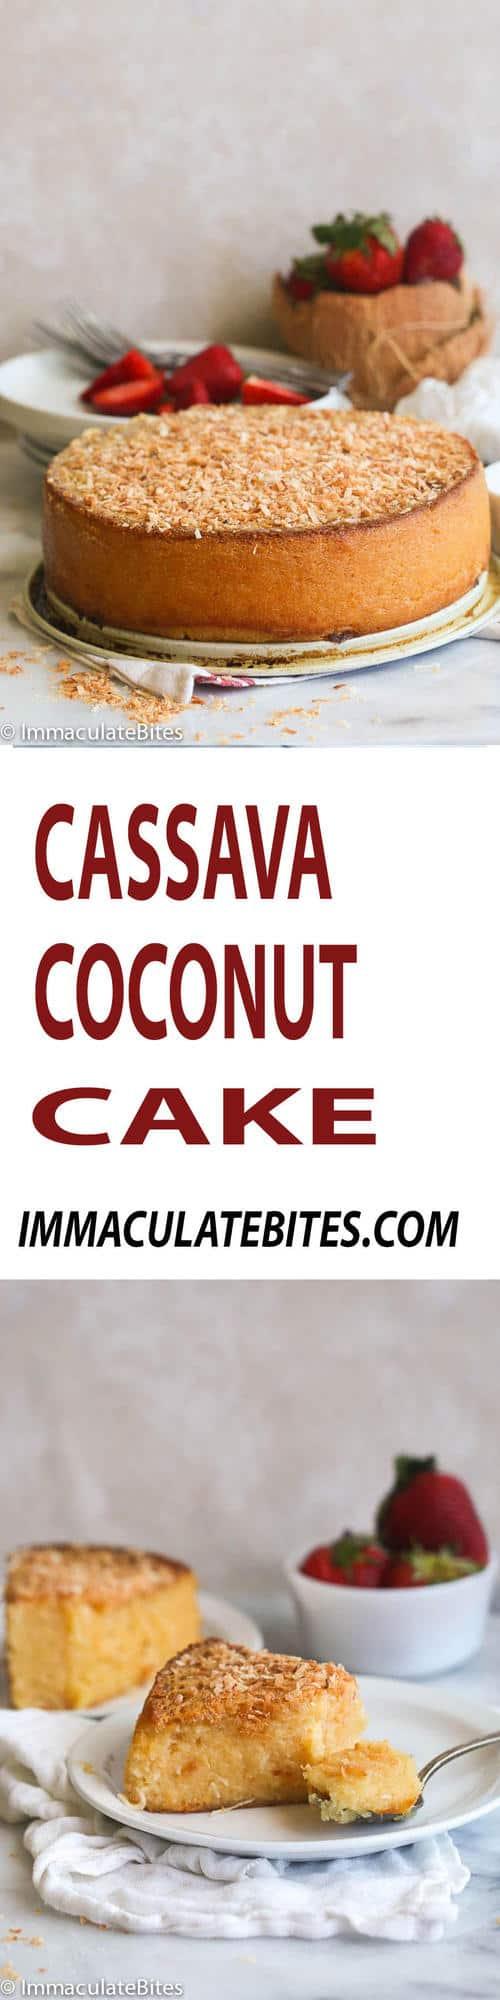 CASSAVA-COCONUT-CAKE